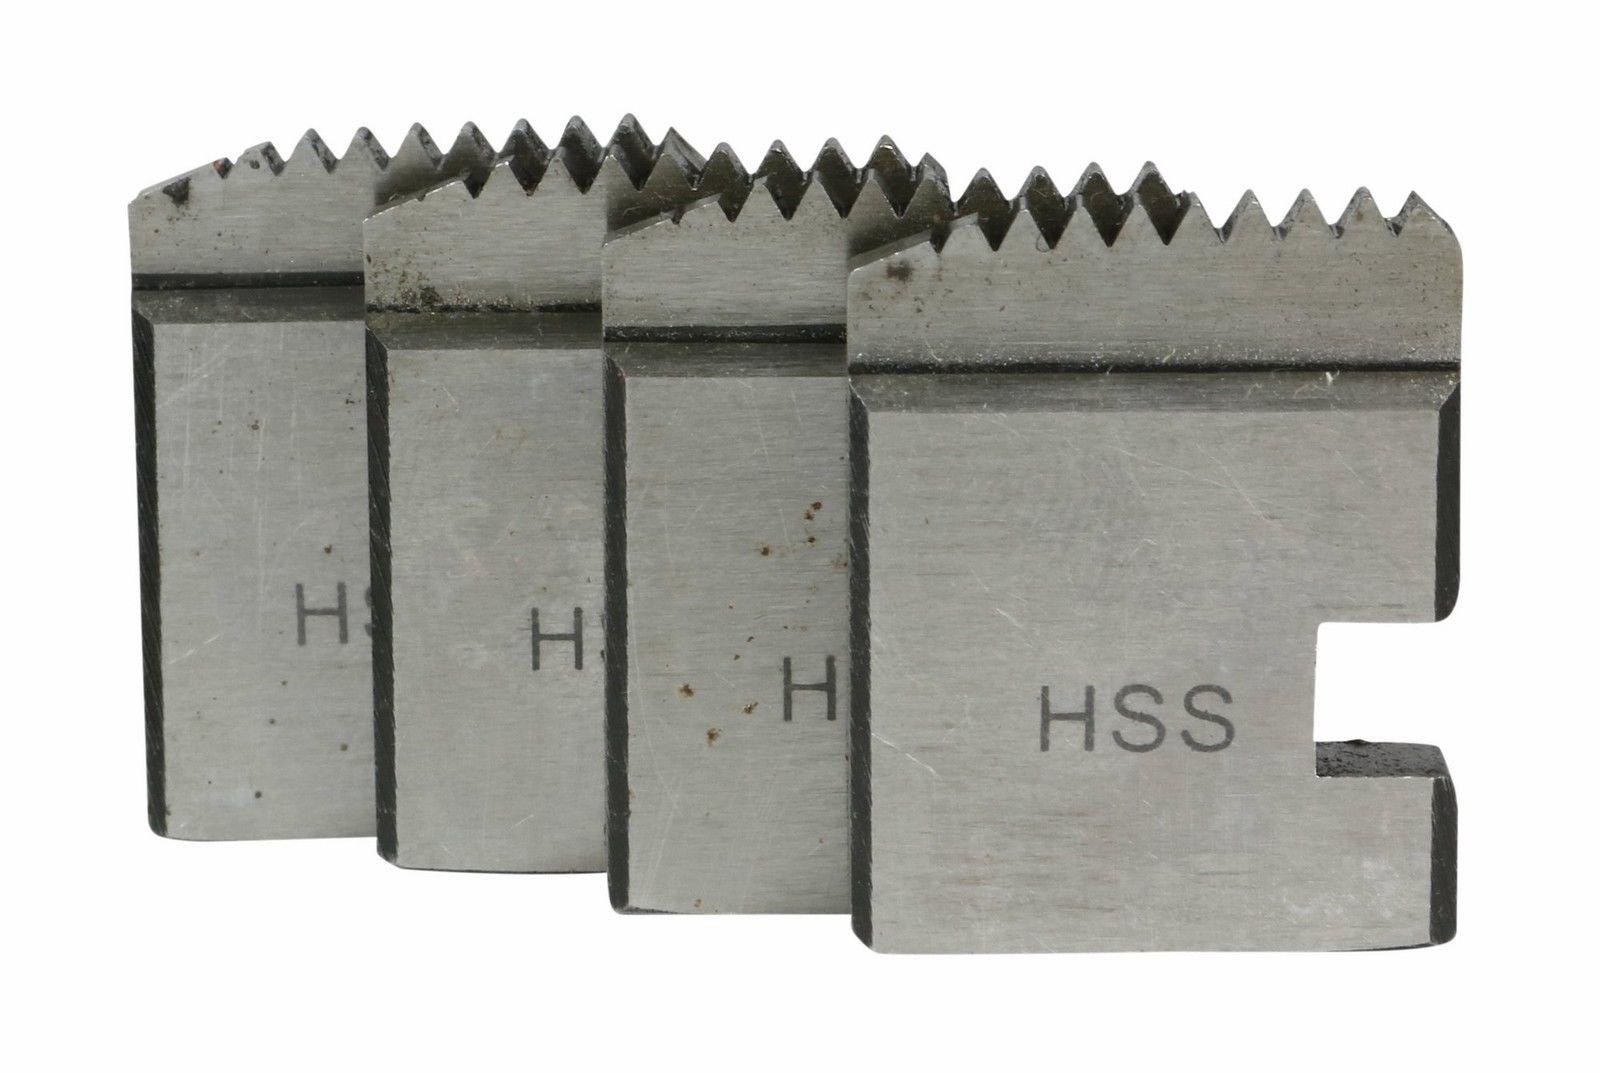 PT 37885 Pipe Dies 1-1/4'' Manual Pipe threader Fits Ridgid 12-R 37885 and RIDGID 700